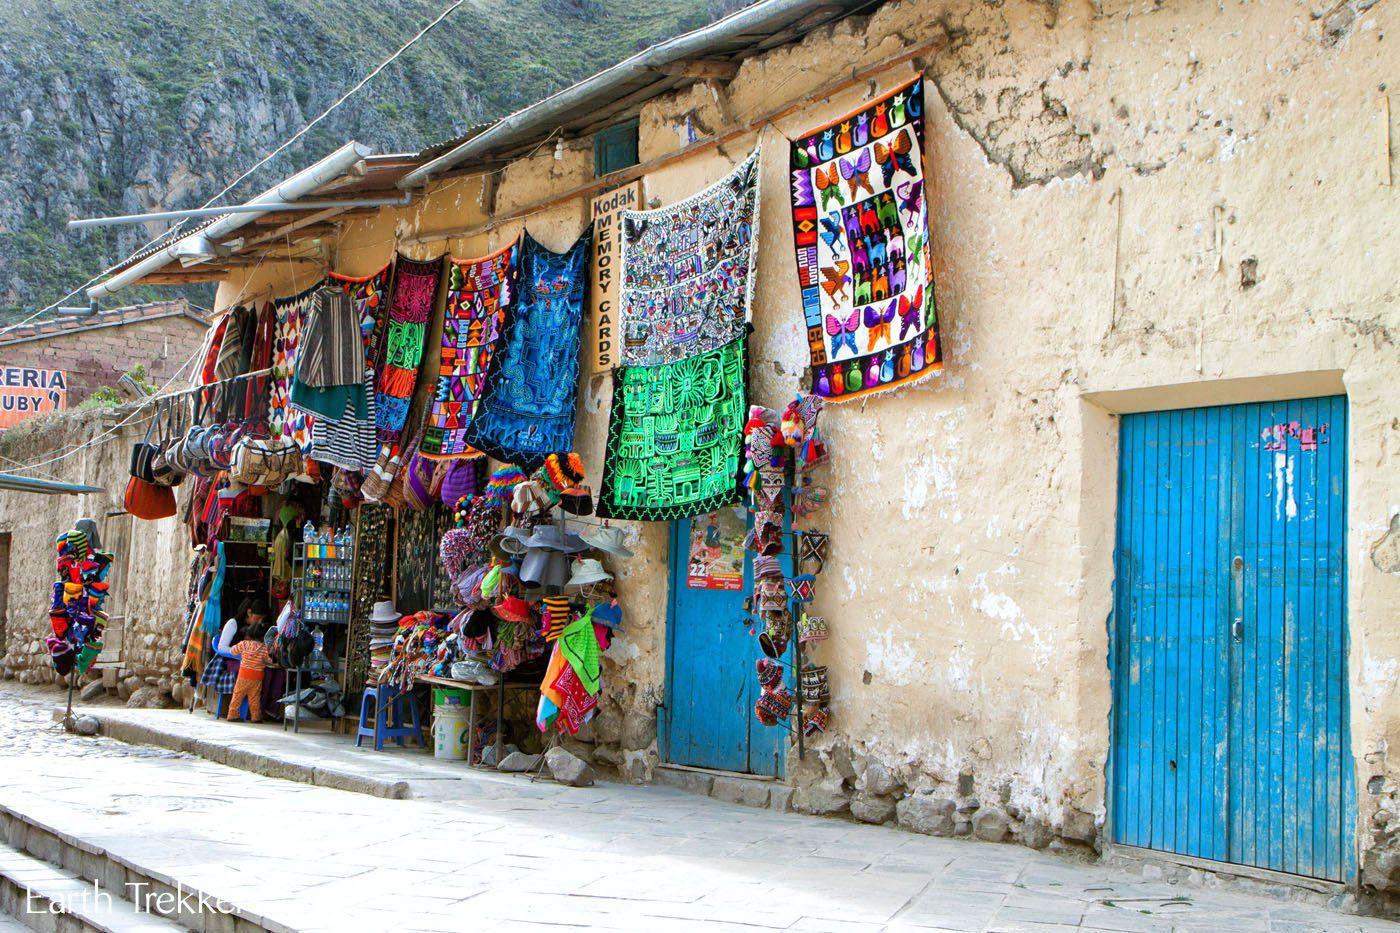 Market in Ollantaytambo